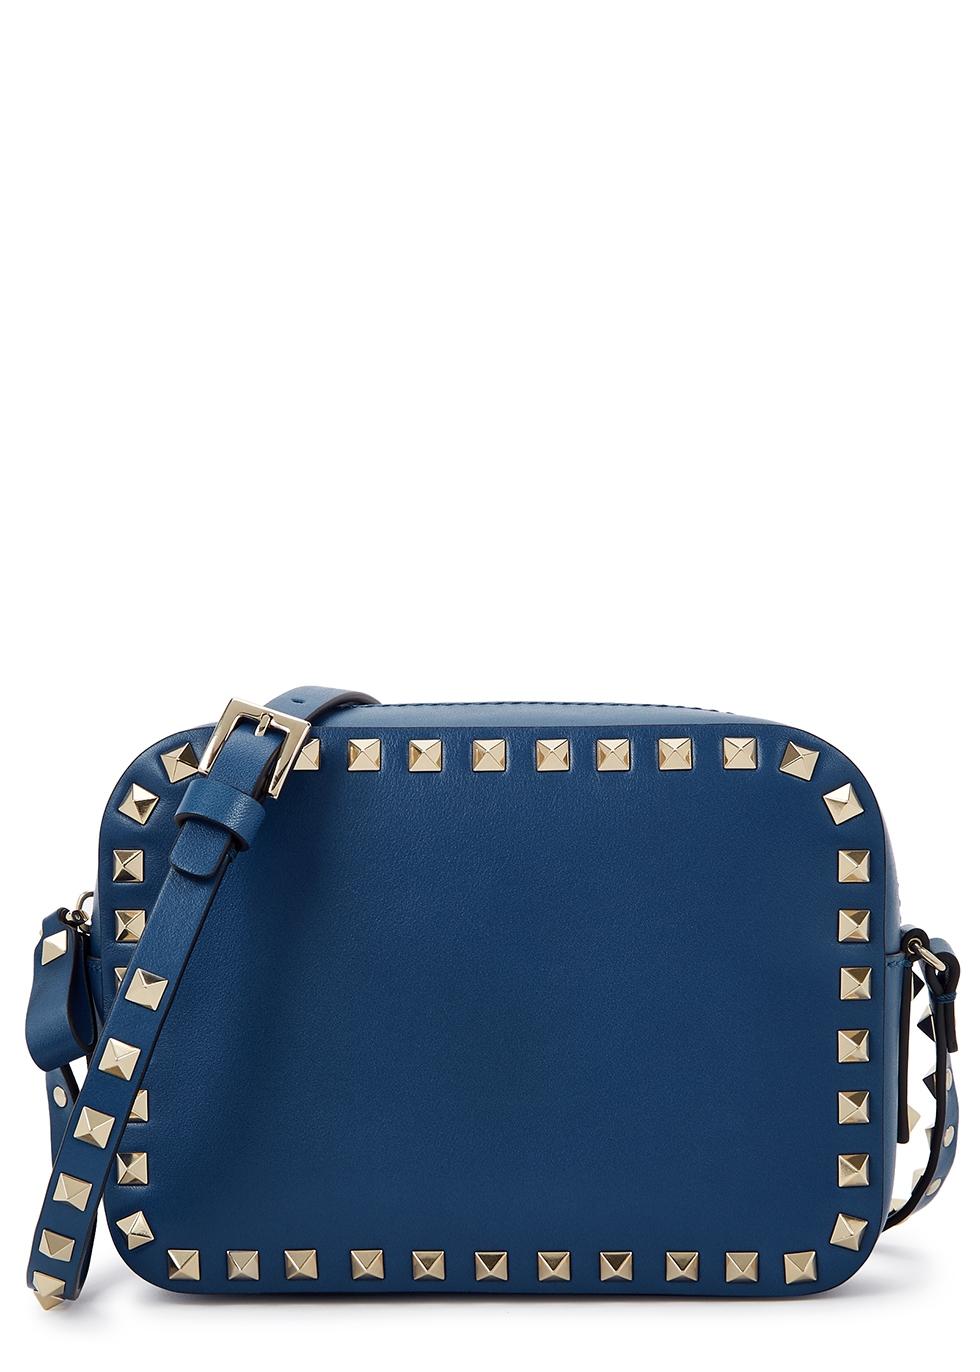 49ecbd2d7d9cd9 Women's new in bags - Harvey Nichols